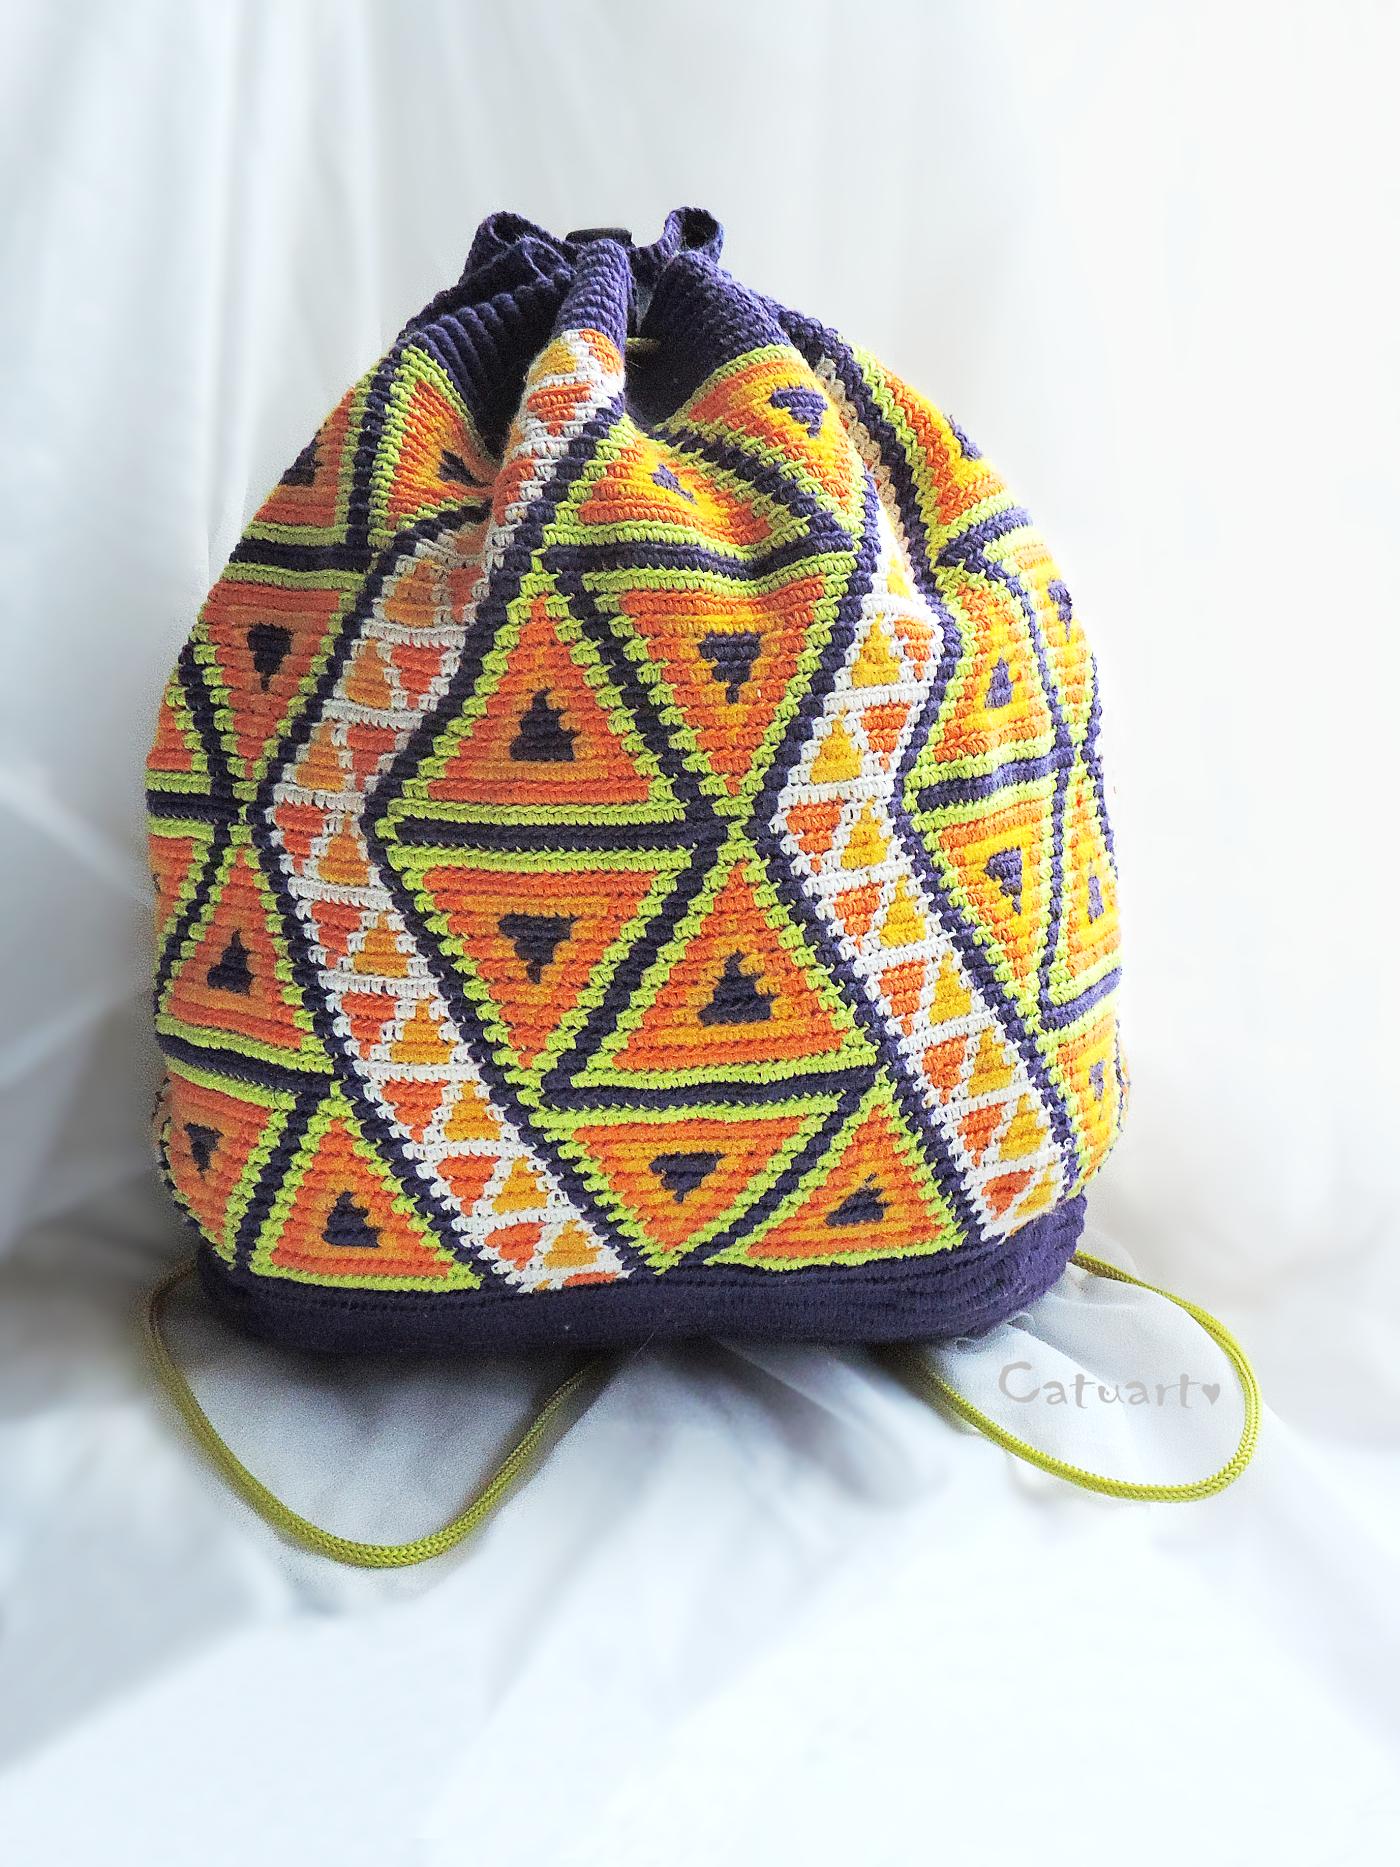 e3920c42fd3f Вязаный крючком рюкзак в этно-стиле